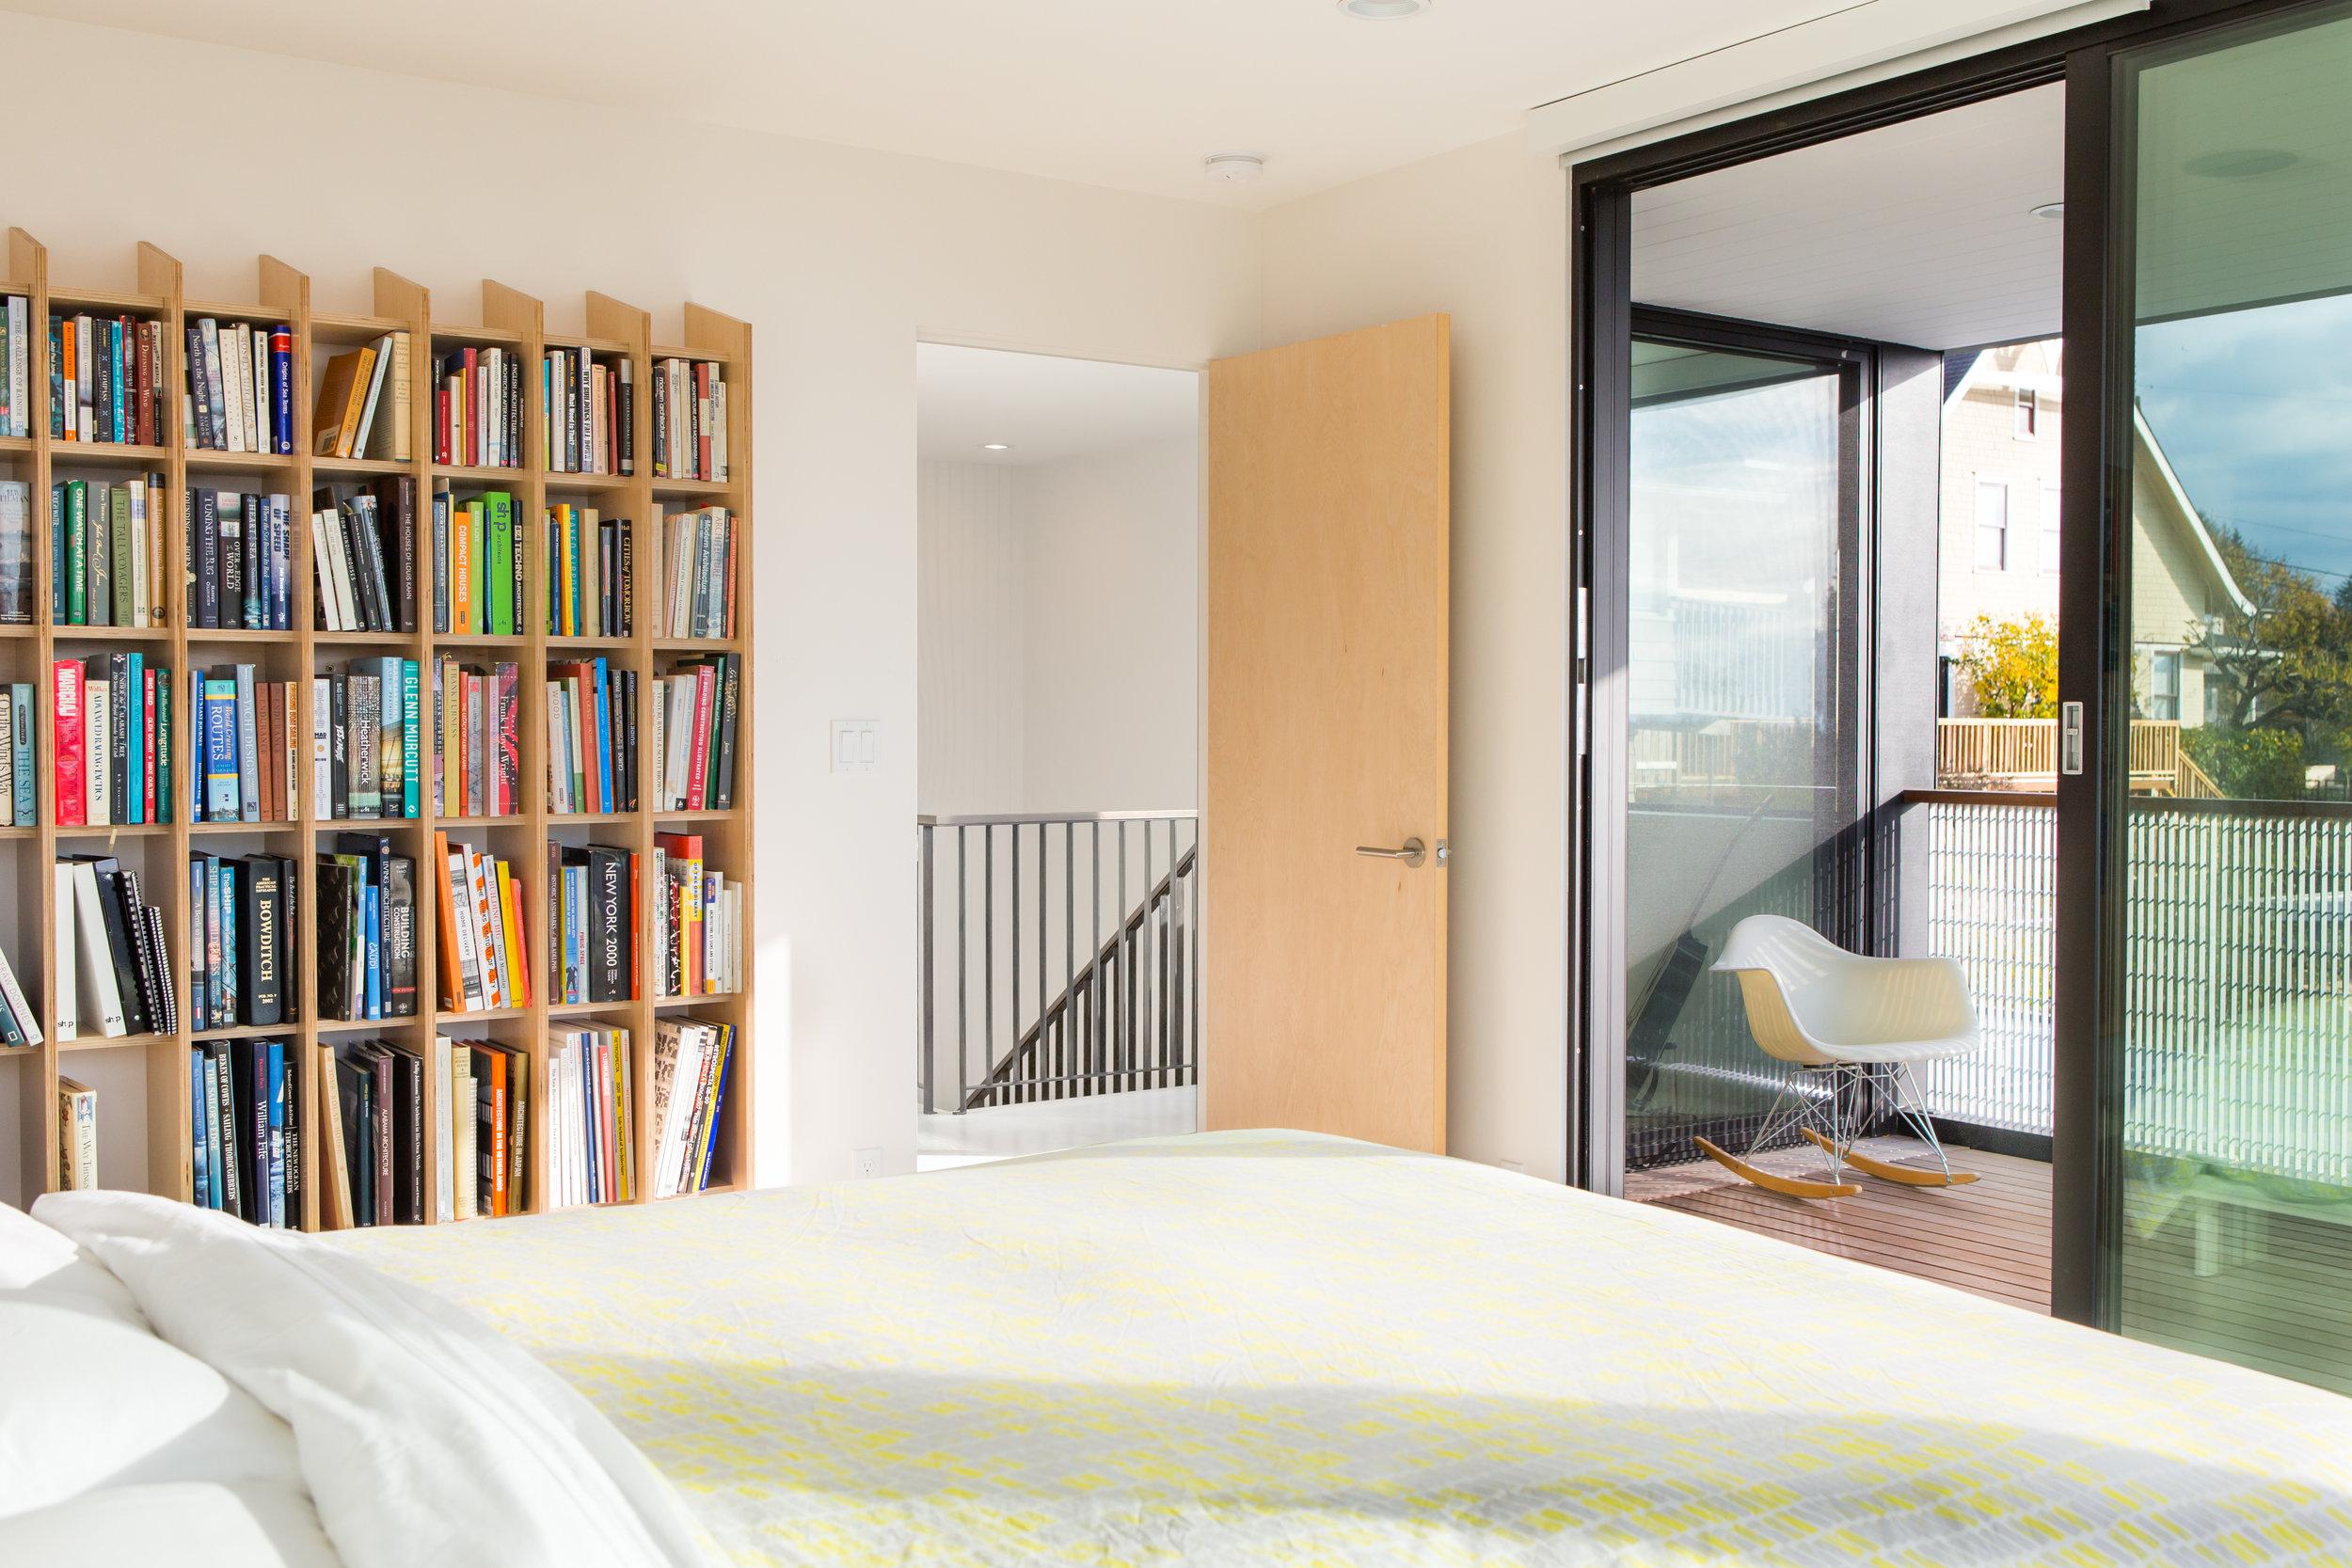 Architecture & Interior Design — Trevor Eiler Creative